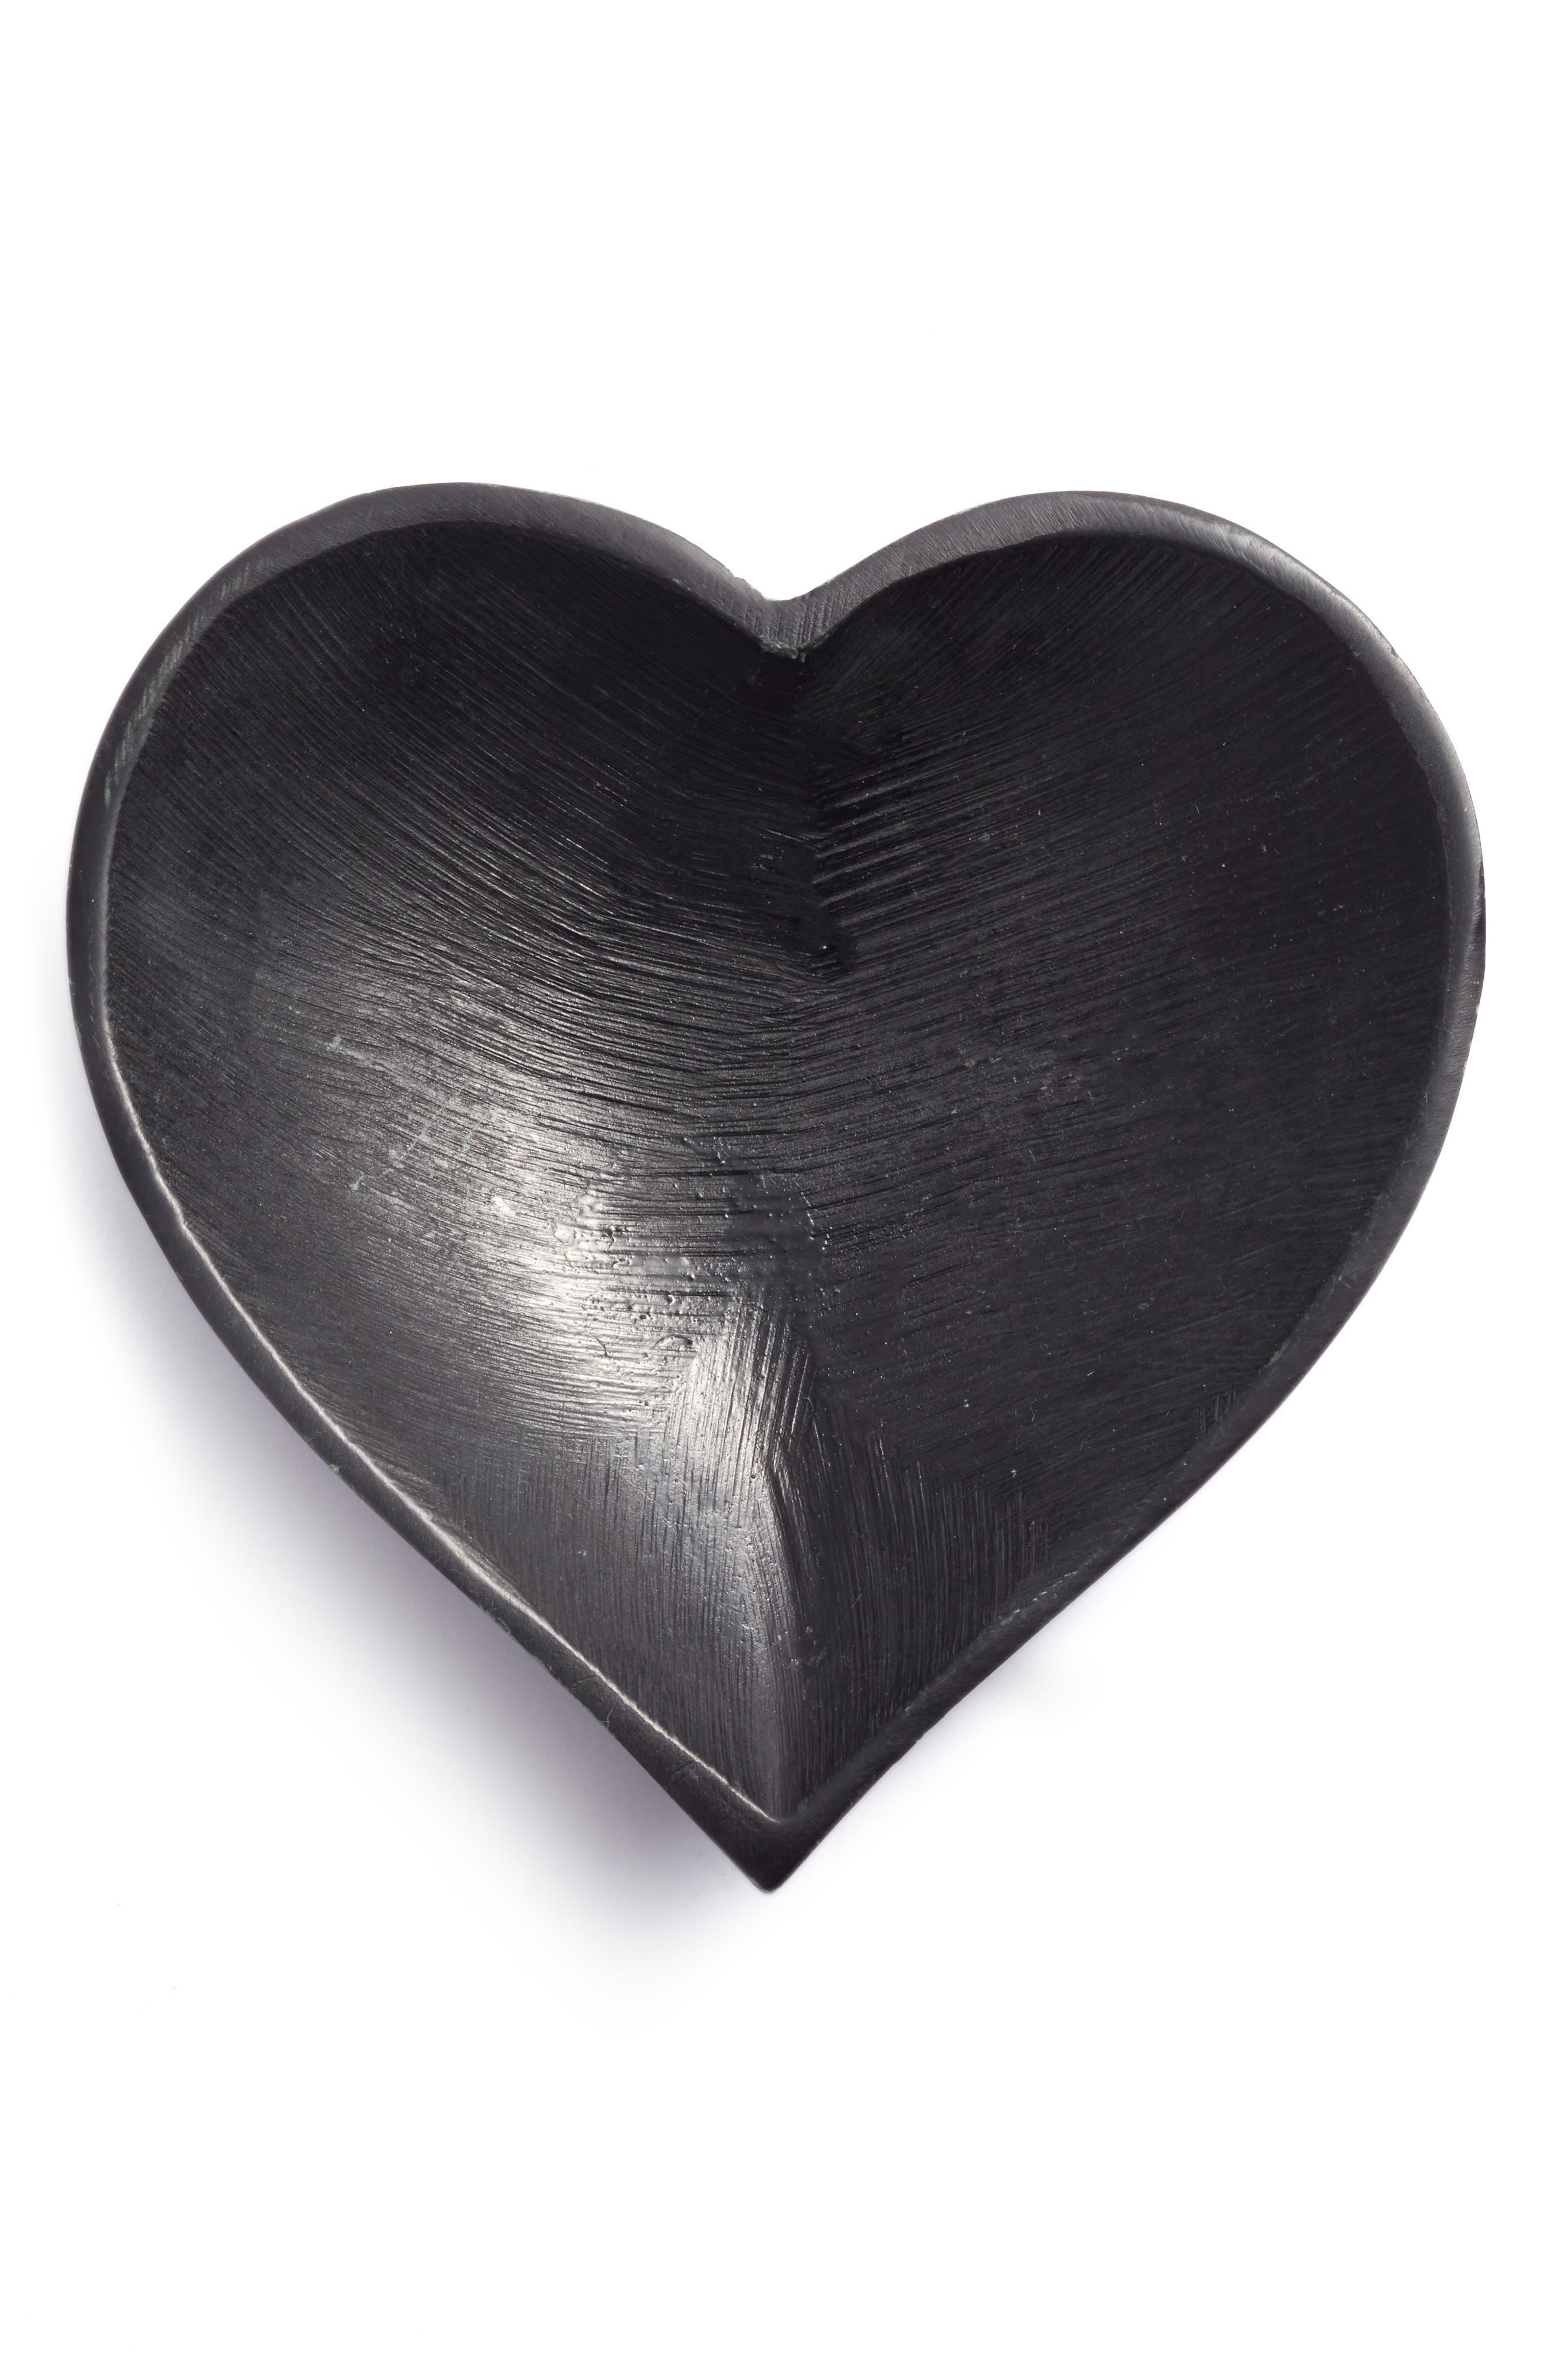 Soapstone Heart Bowl,                         Main,                         color, Black